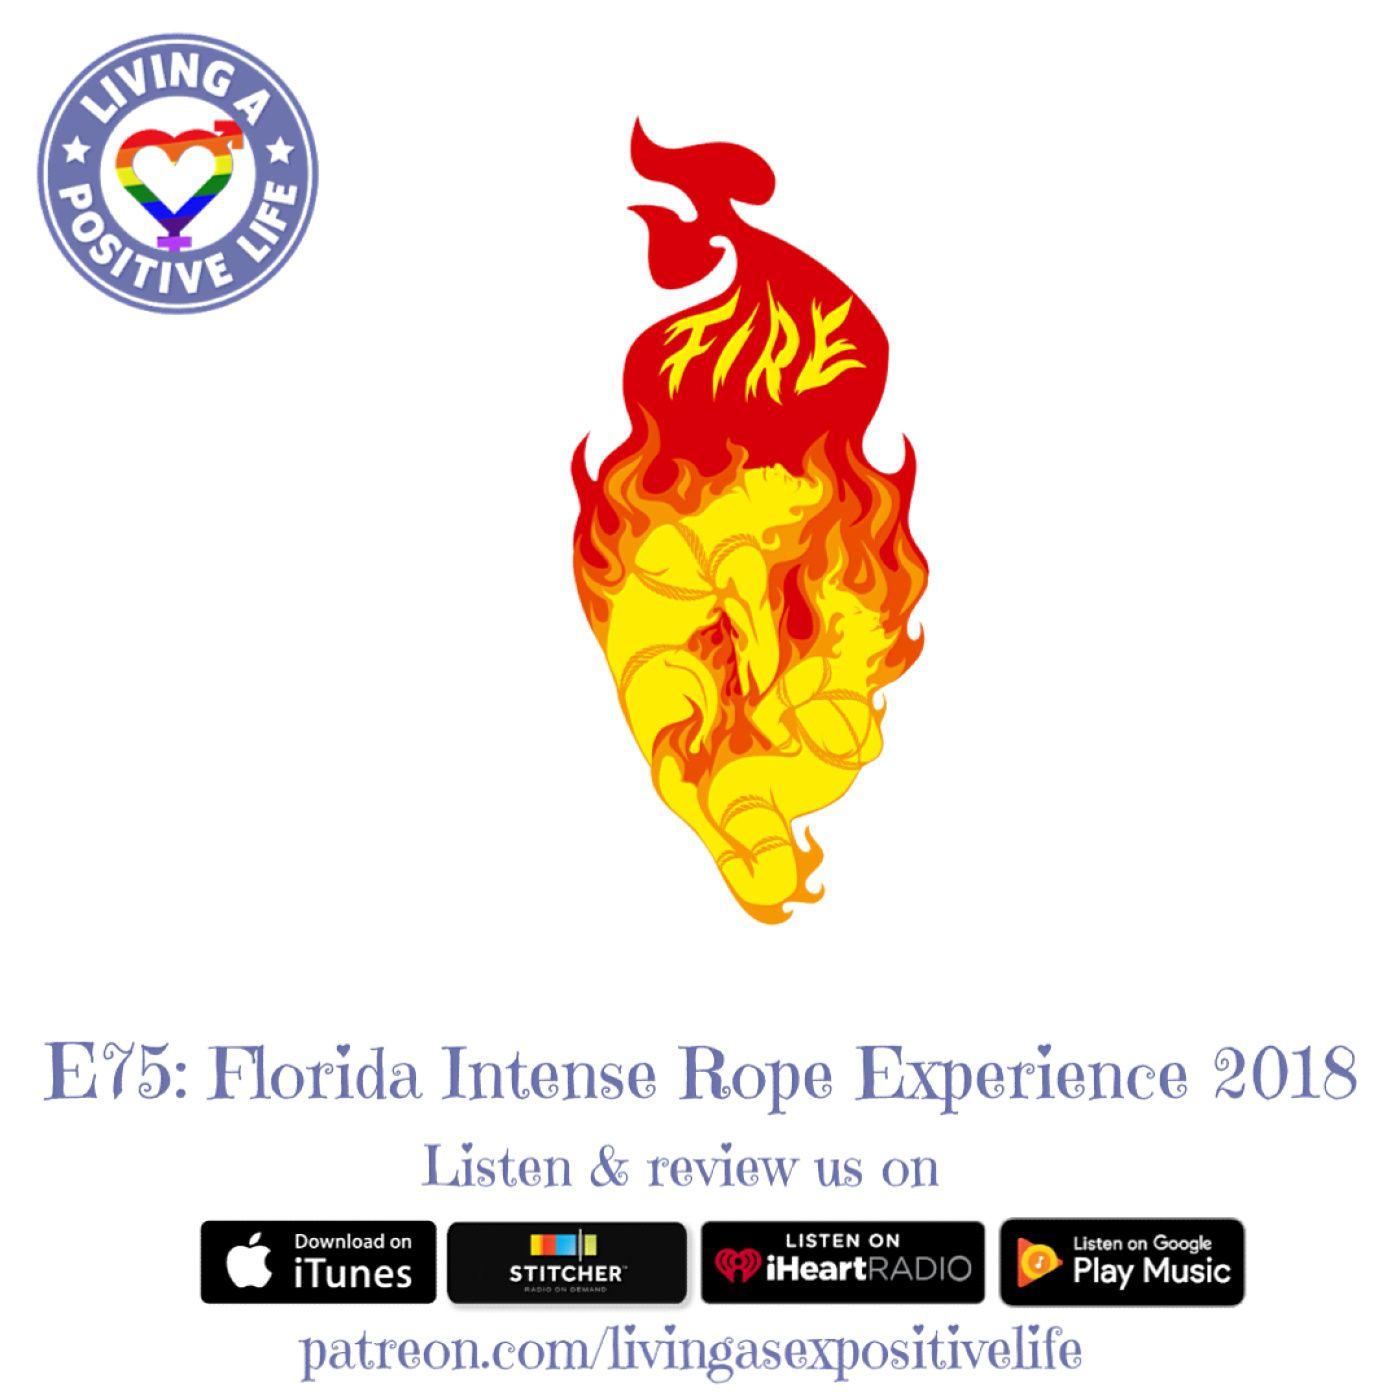 Sex Positive Me - E75: Florida Intense Rope Experience 2018